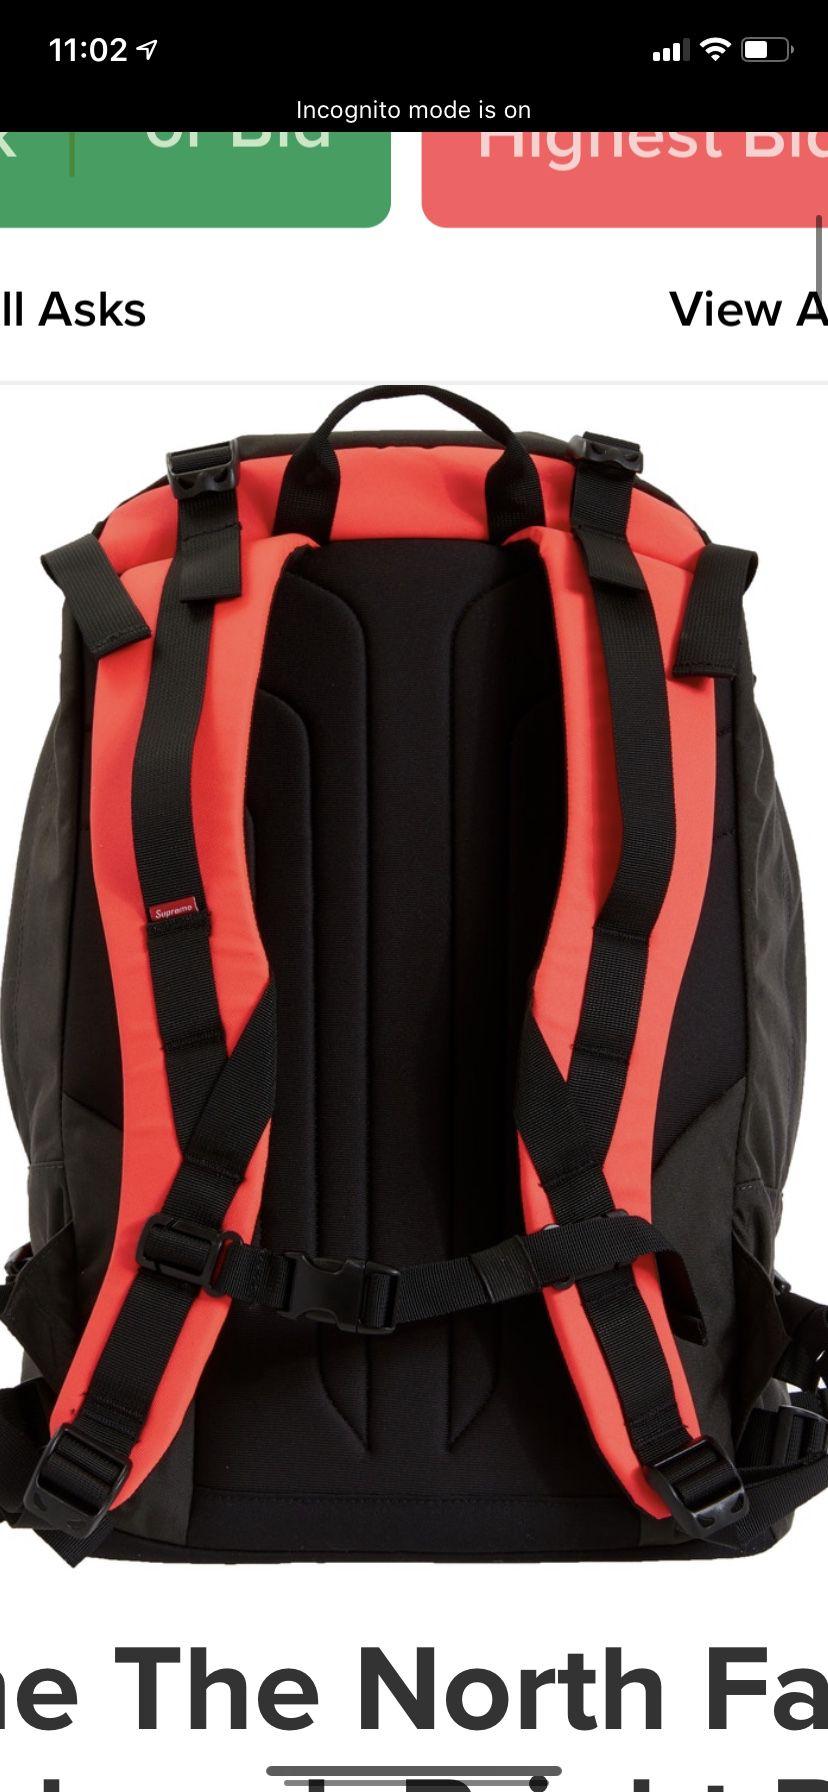 Supreme x Northface backpack